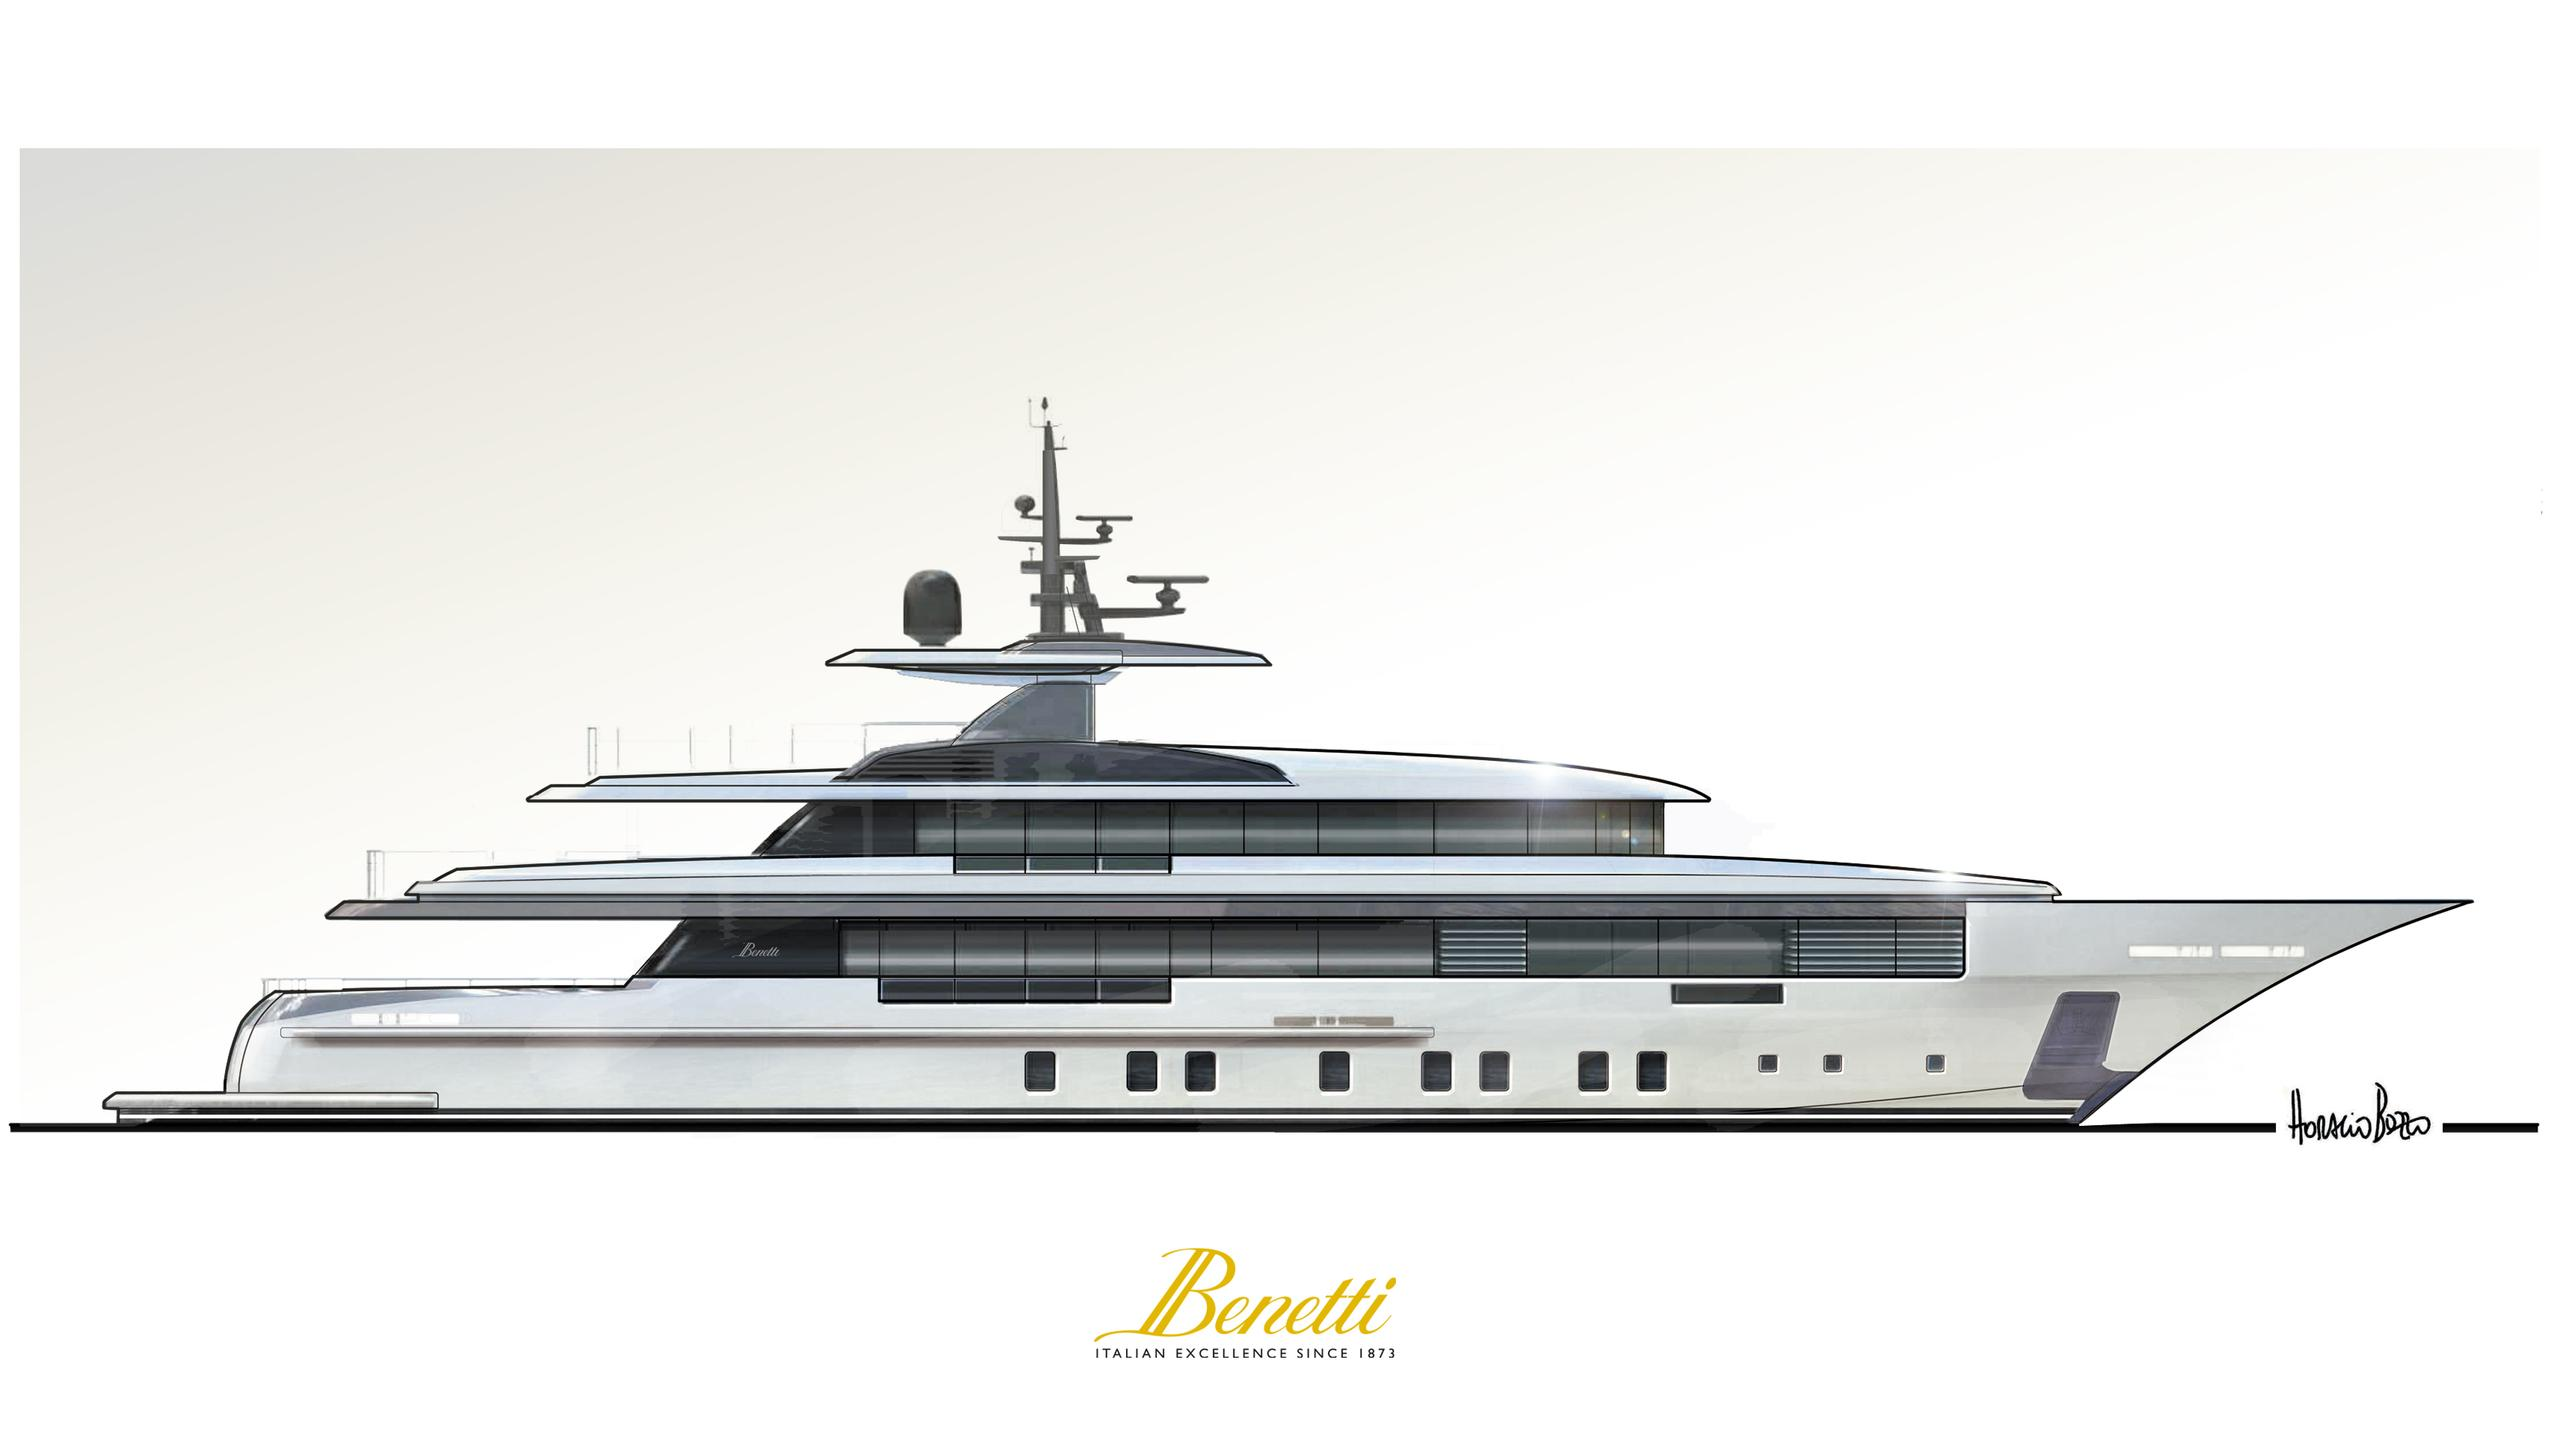 project zafiro fb702 motoryacht benetti yachts 48m 2018 rendering